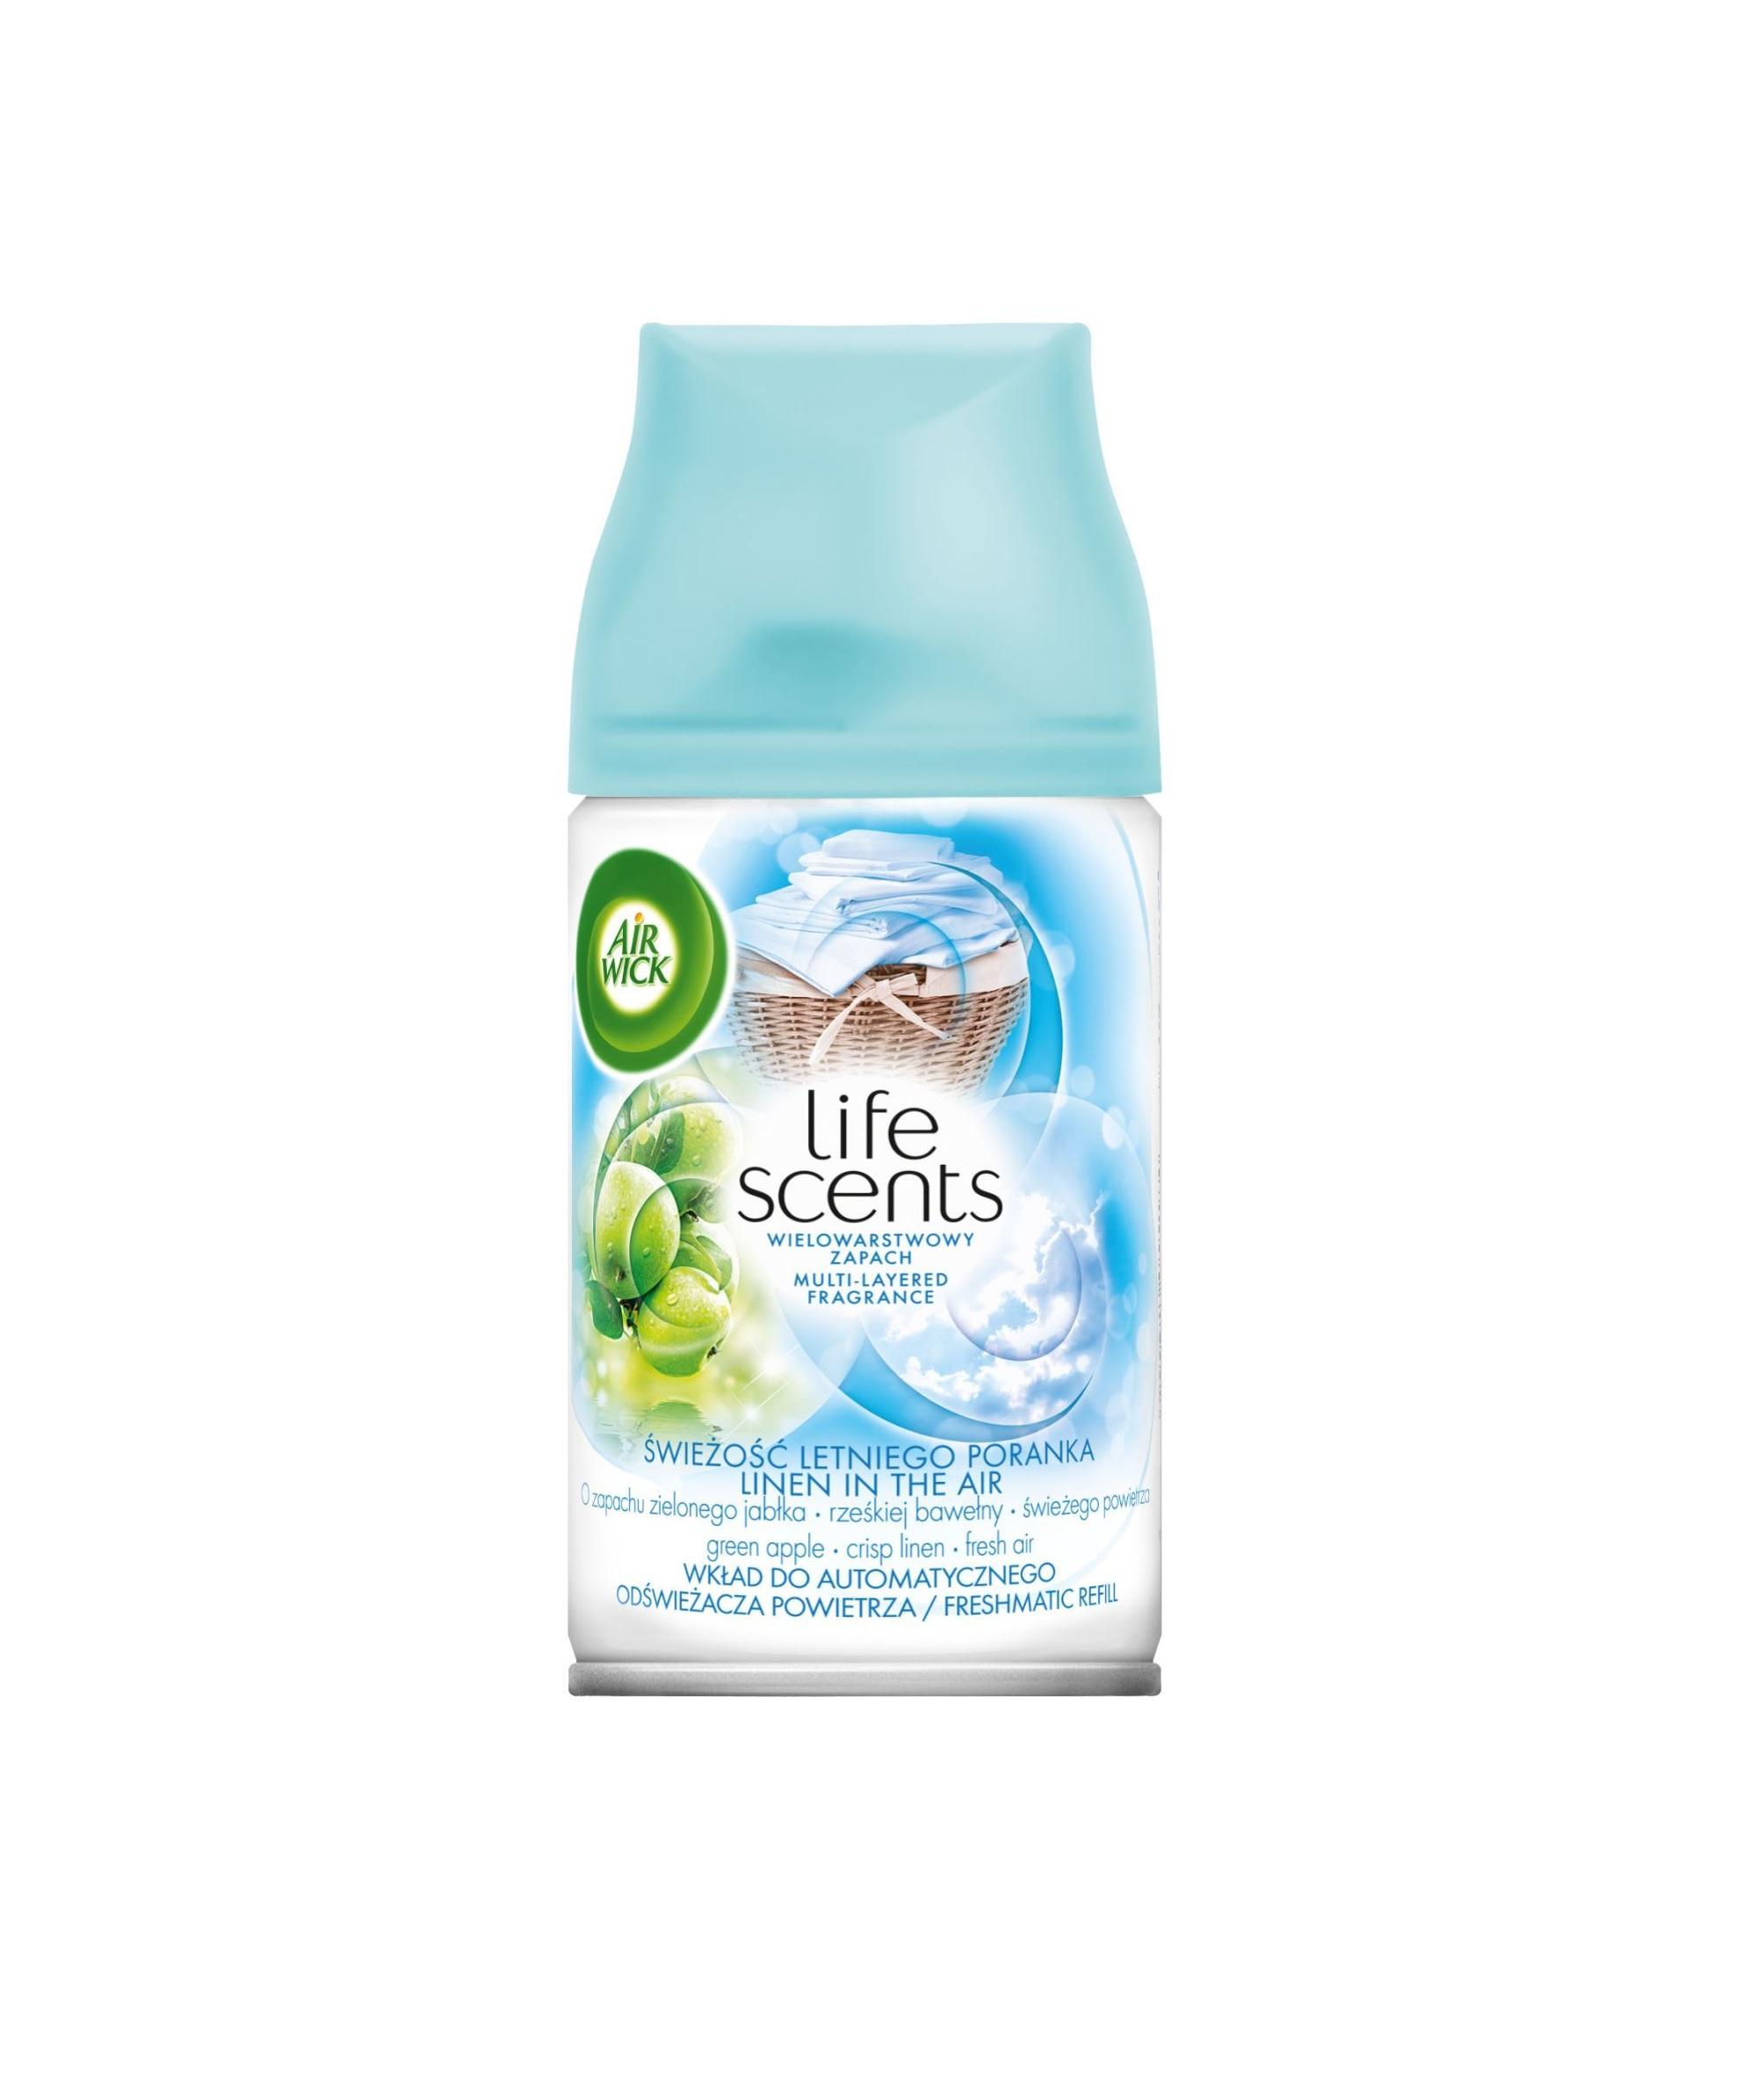 AIRWICK max-refill-life-scents užpildas 250 ml